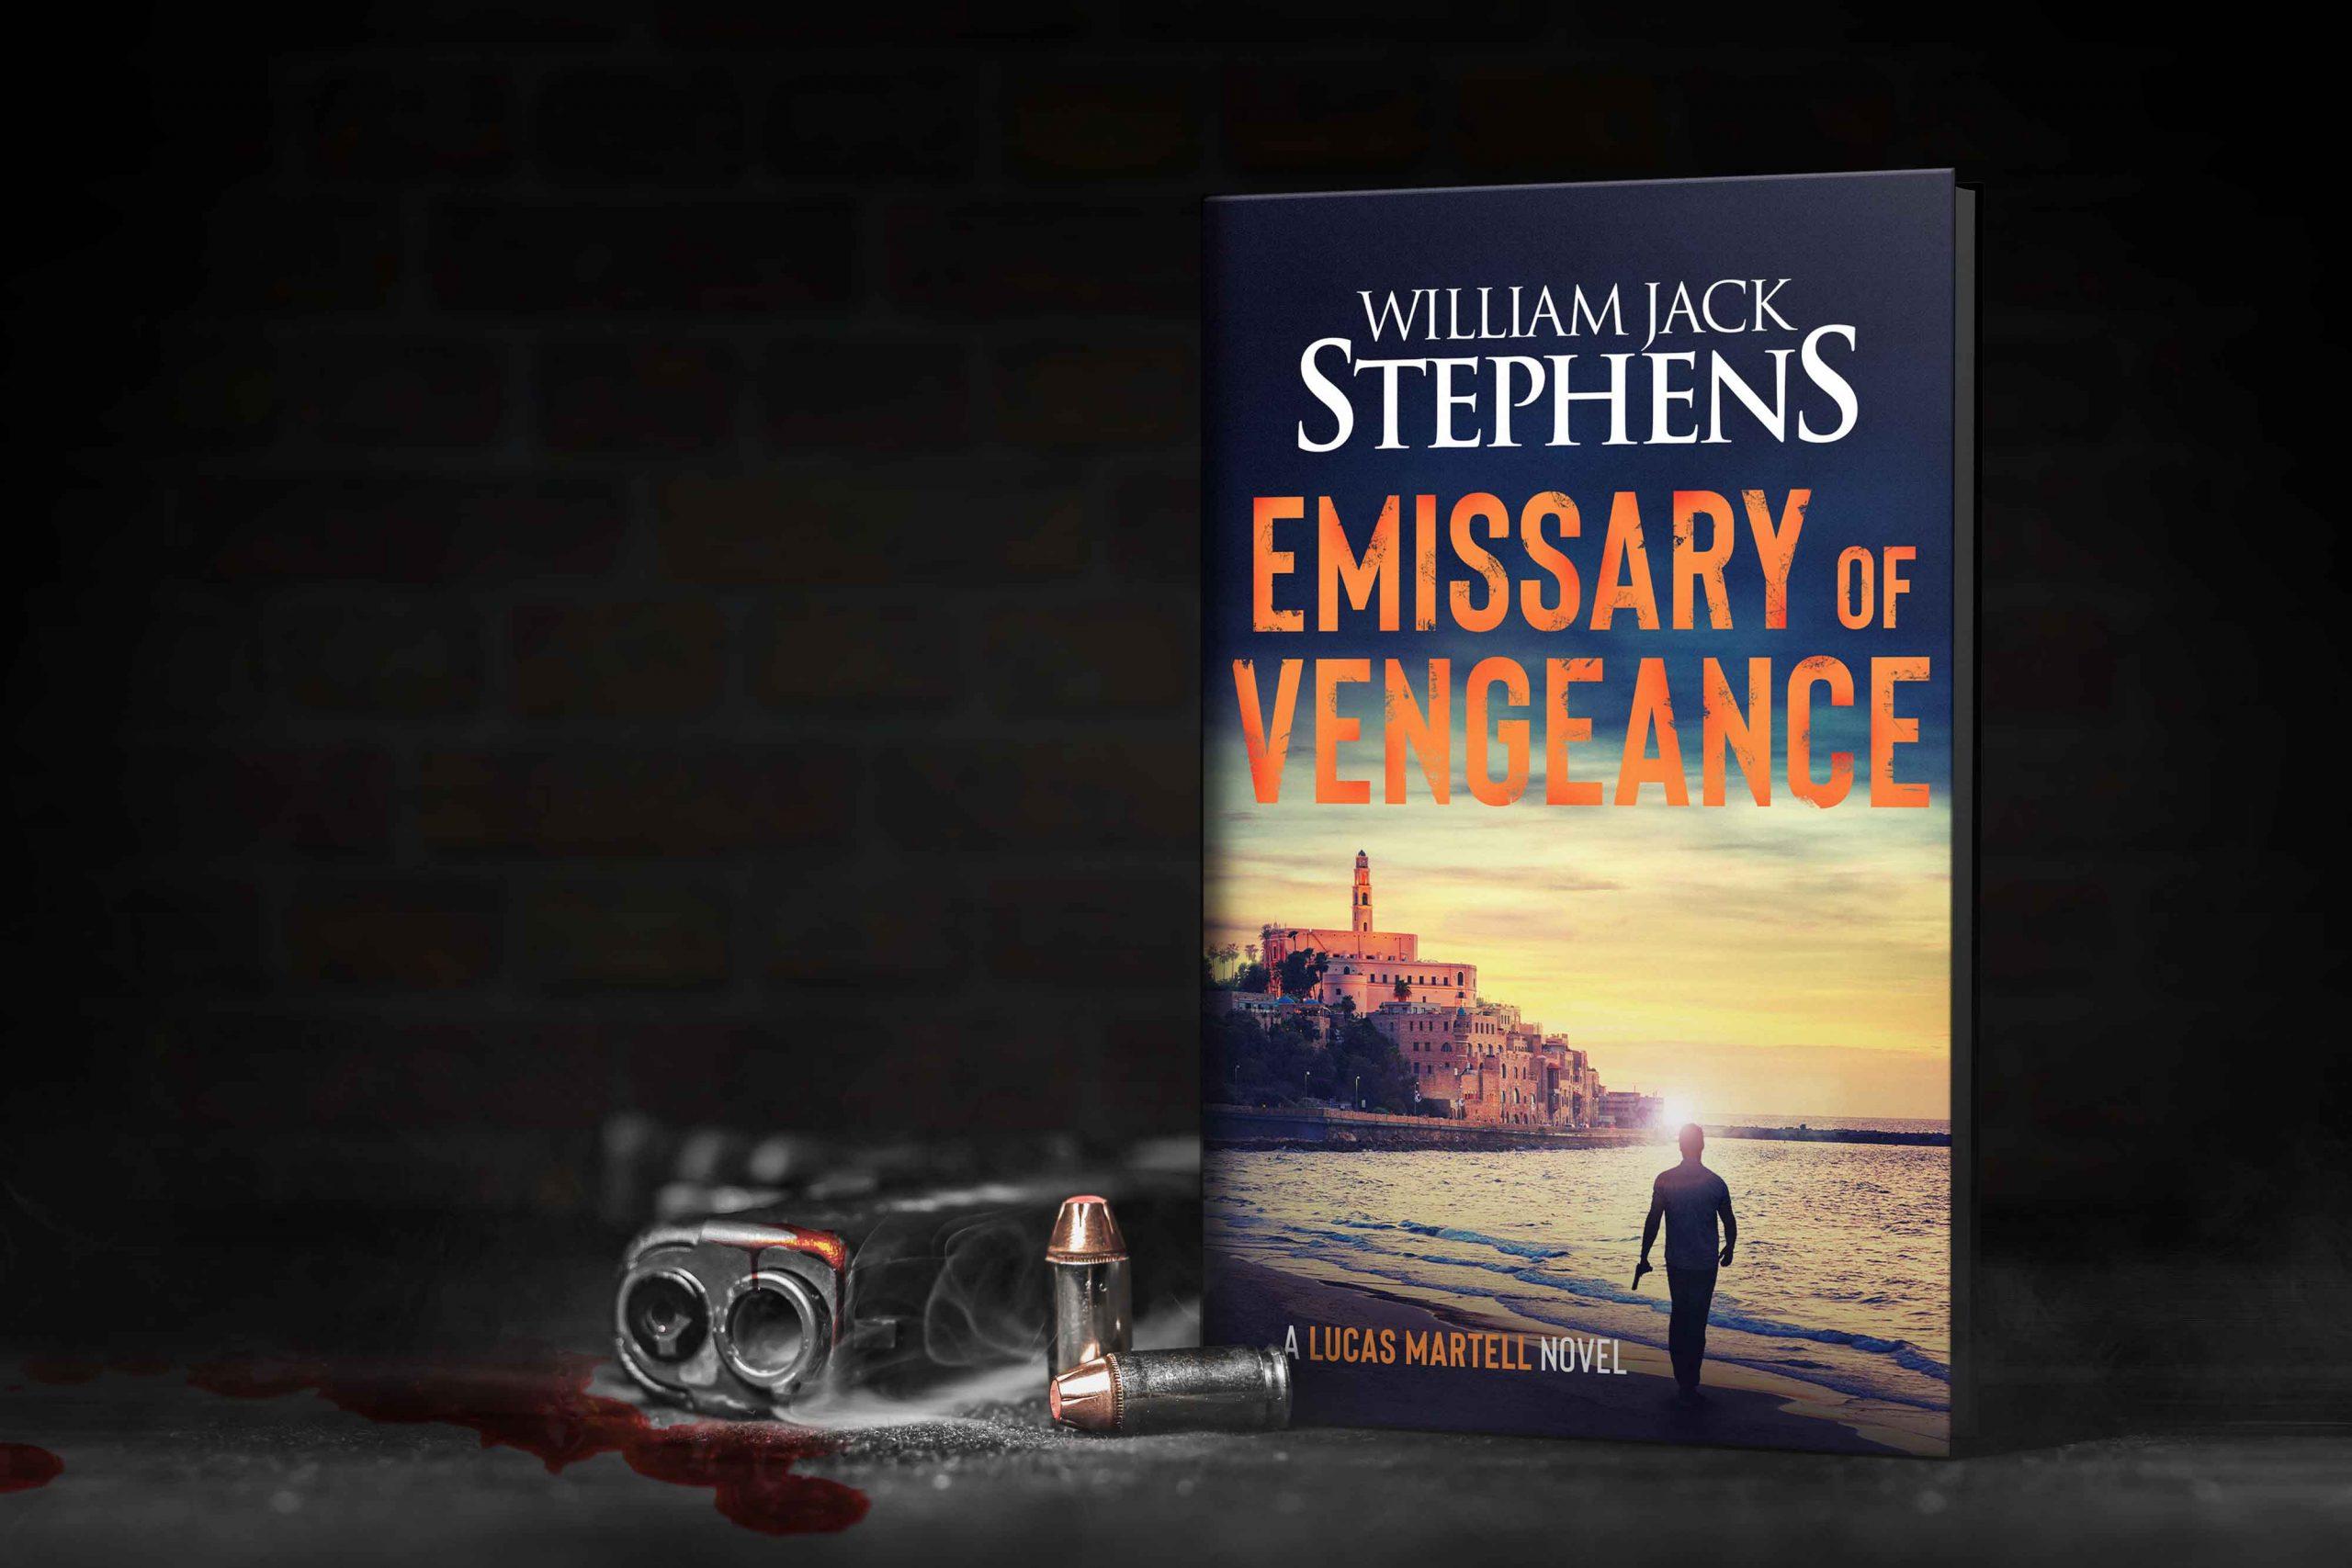 Emissary of Vengeance by William Jack Stephens